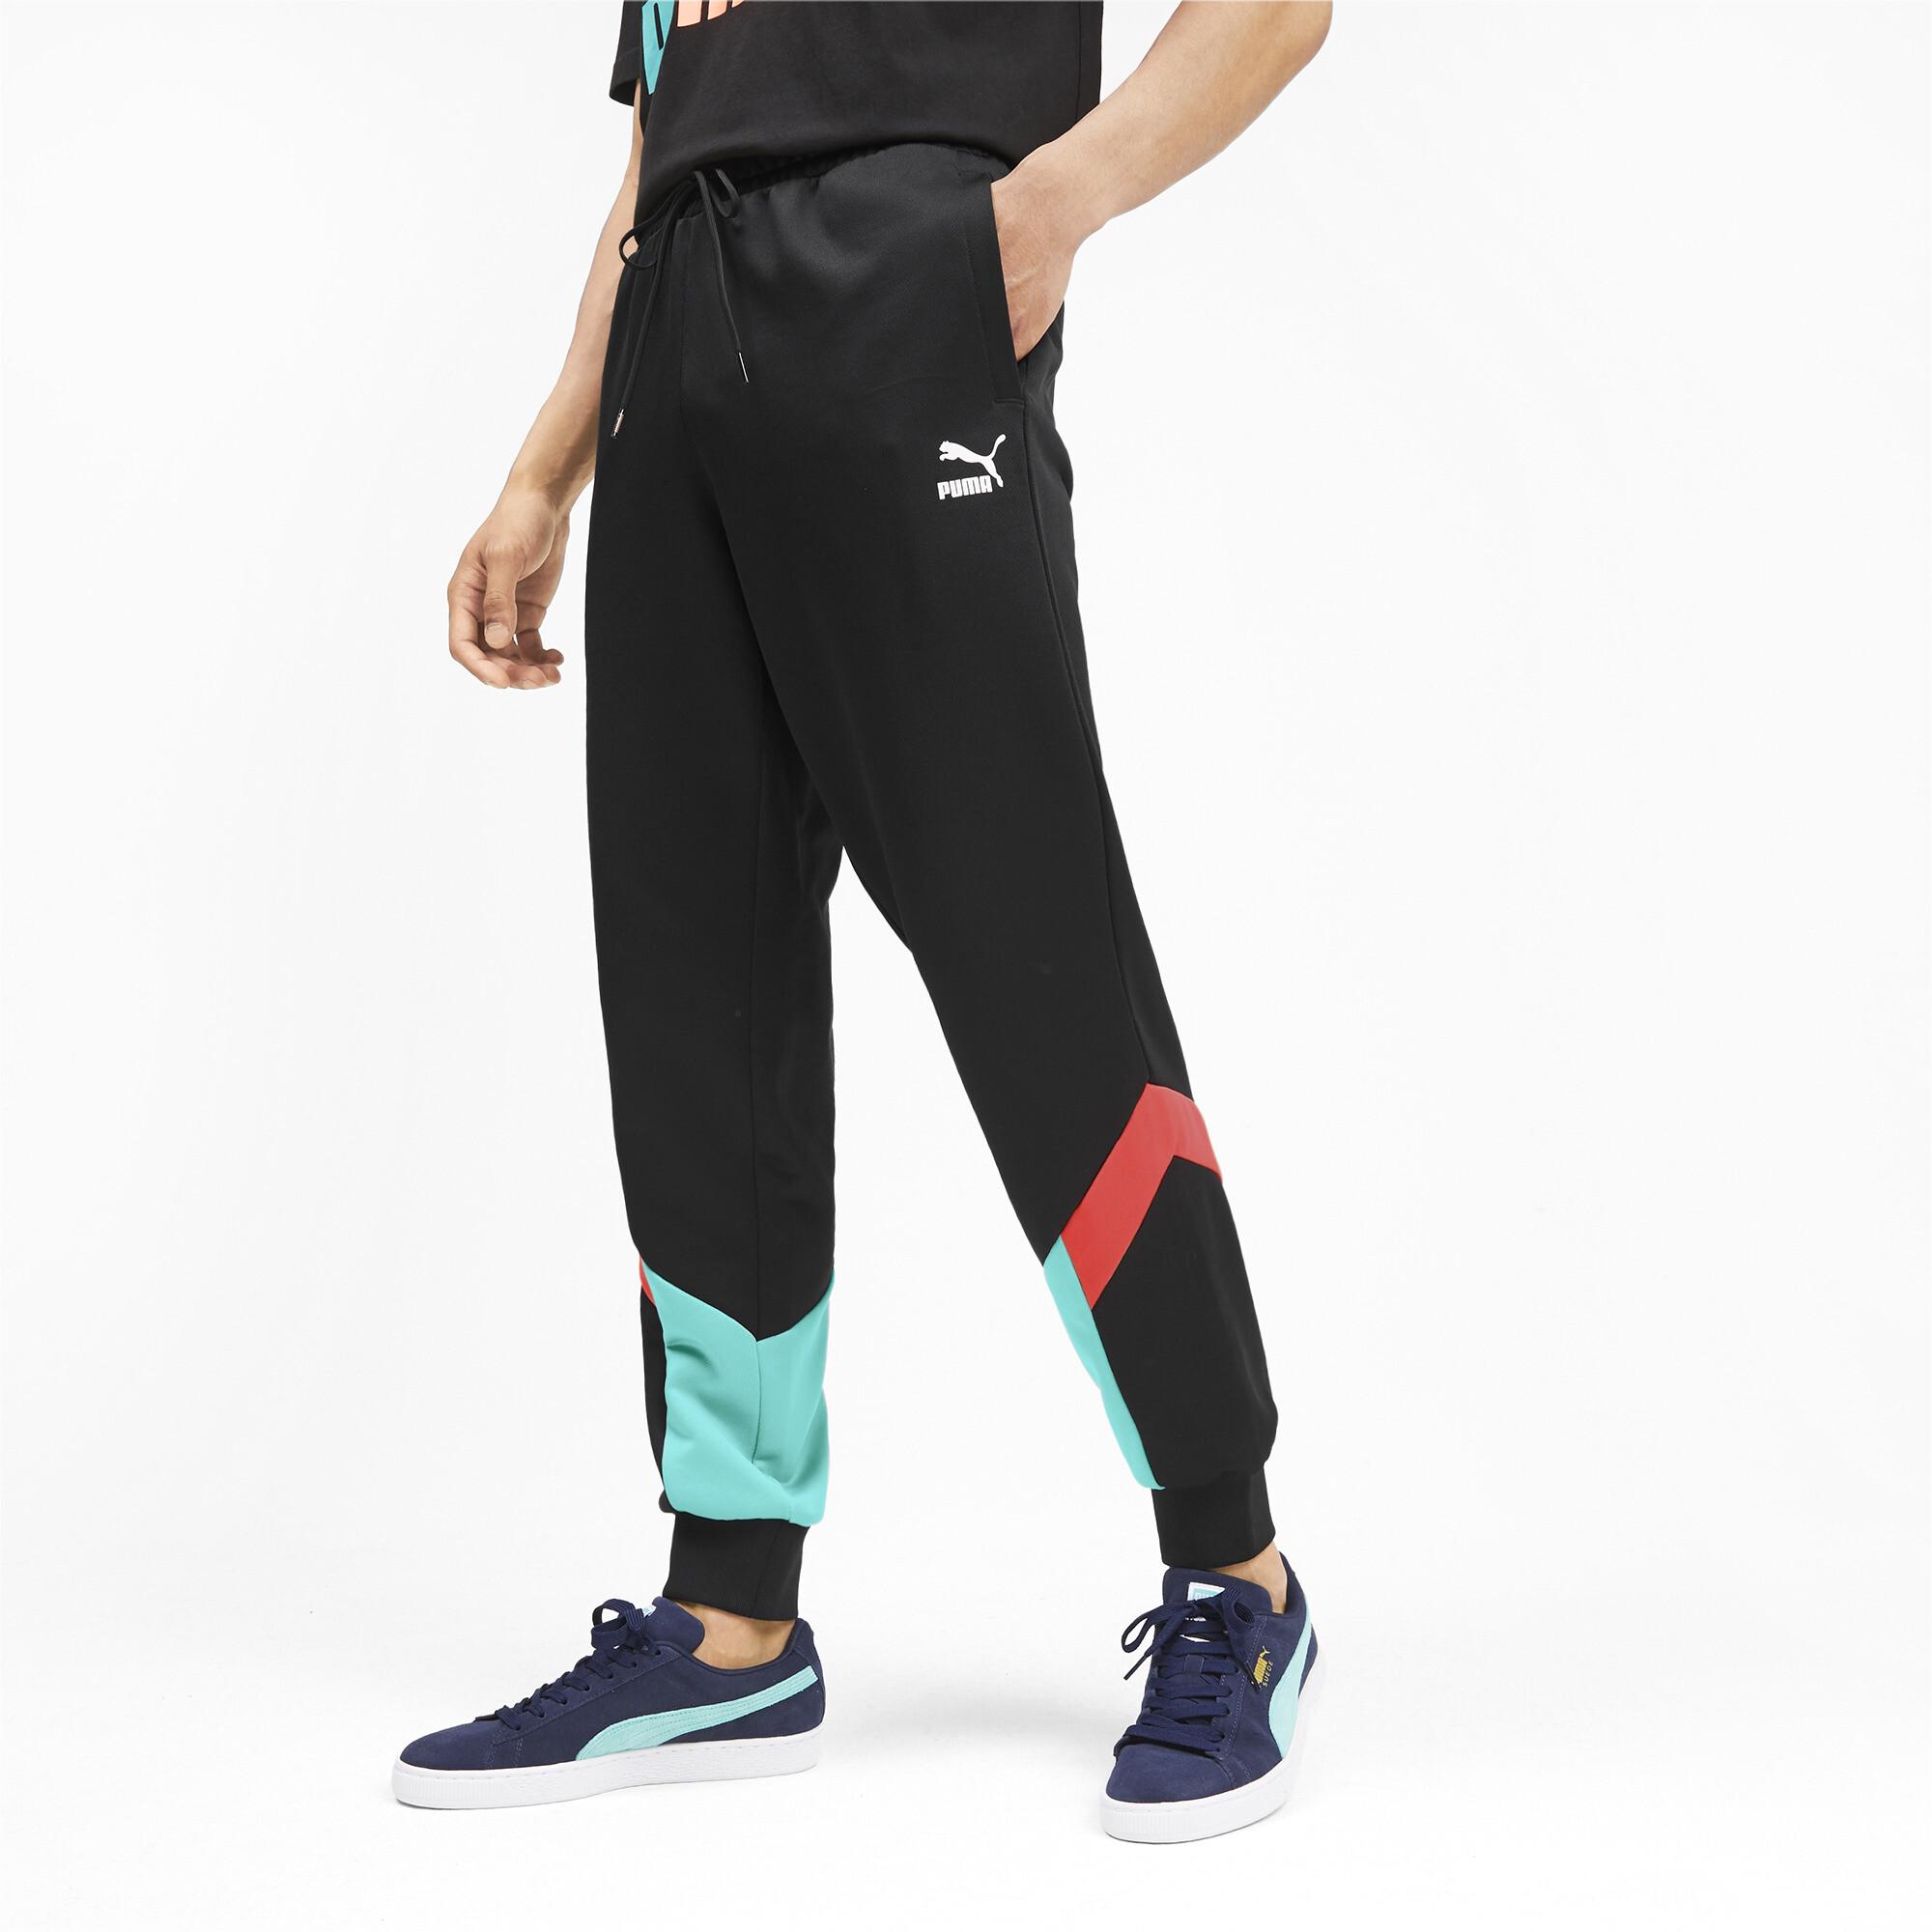 PUMA-Iconic-MCS-Men-039-s-Track-Pants-Men-Knitted-Pants-Sport-Classics thumbnail 15